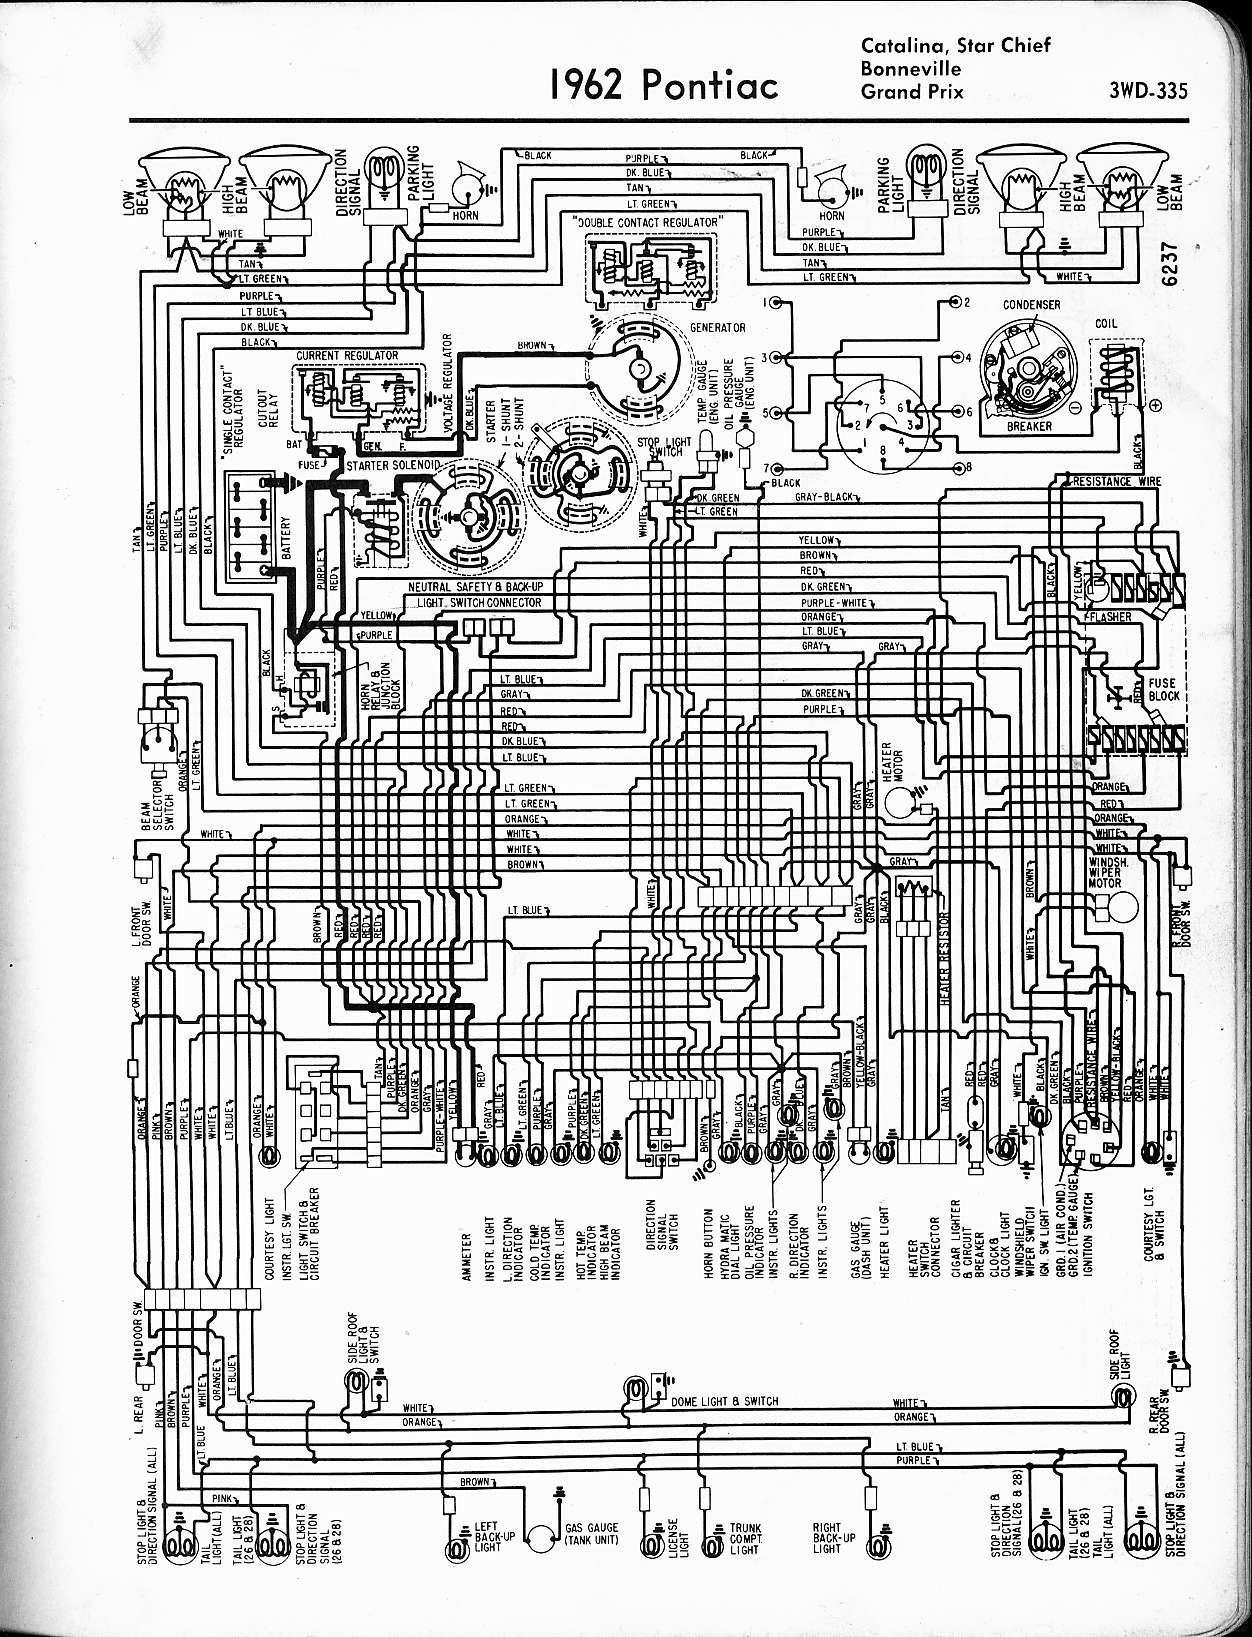 1956 Pontiac Wiring | Wiring Diagram - 2006 Pontiac Grand Prix Radio Wiring Diagram